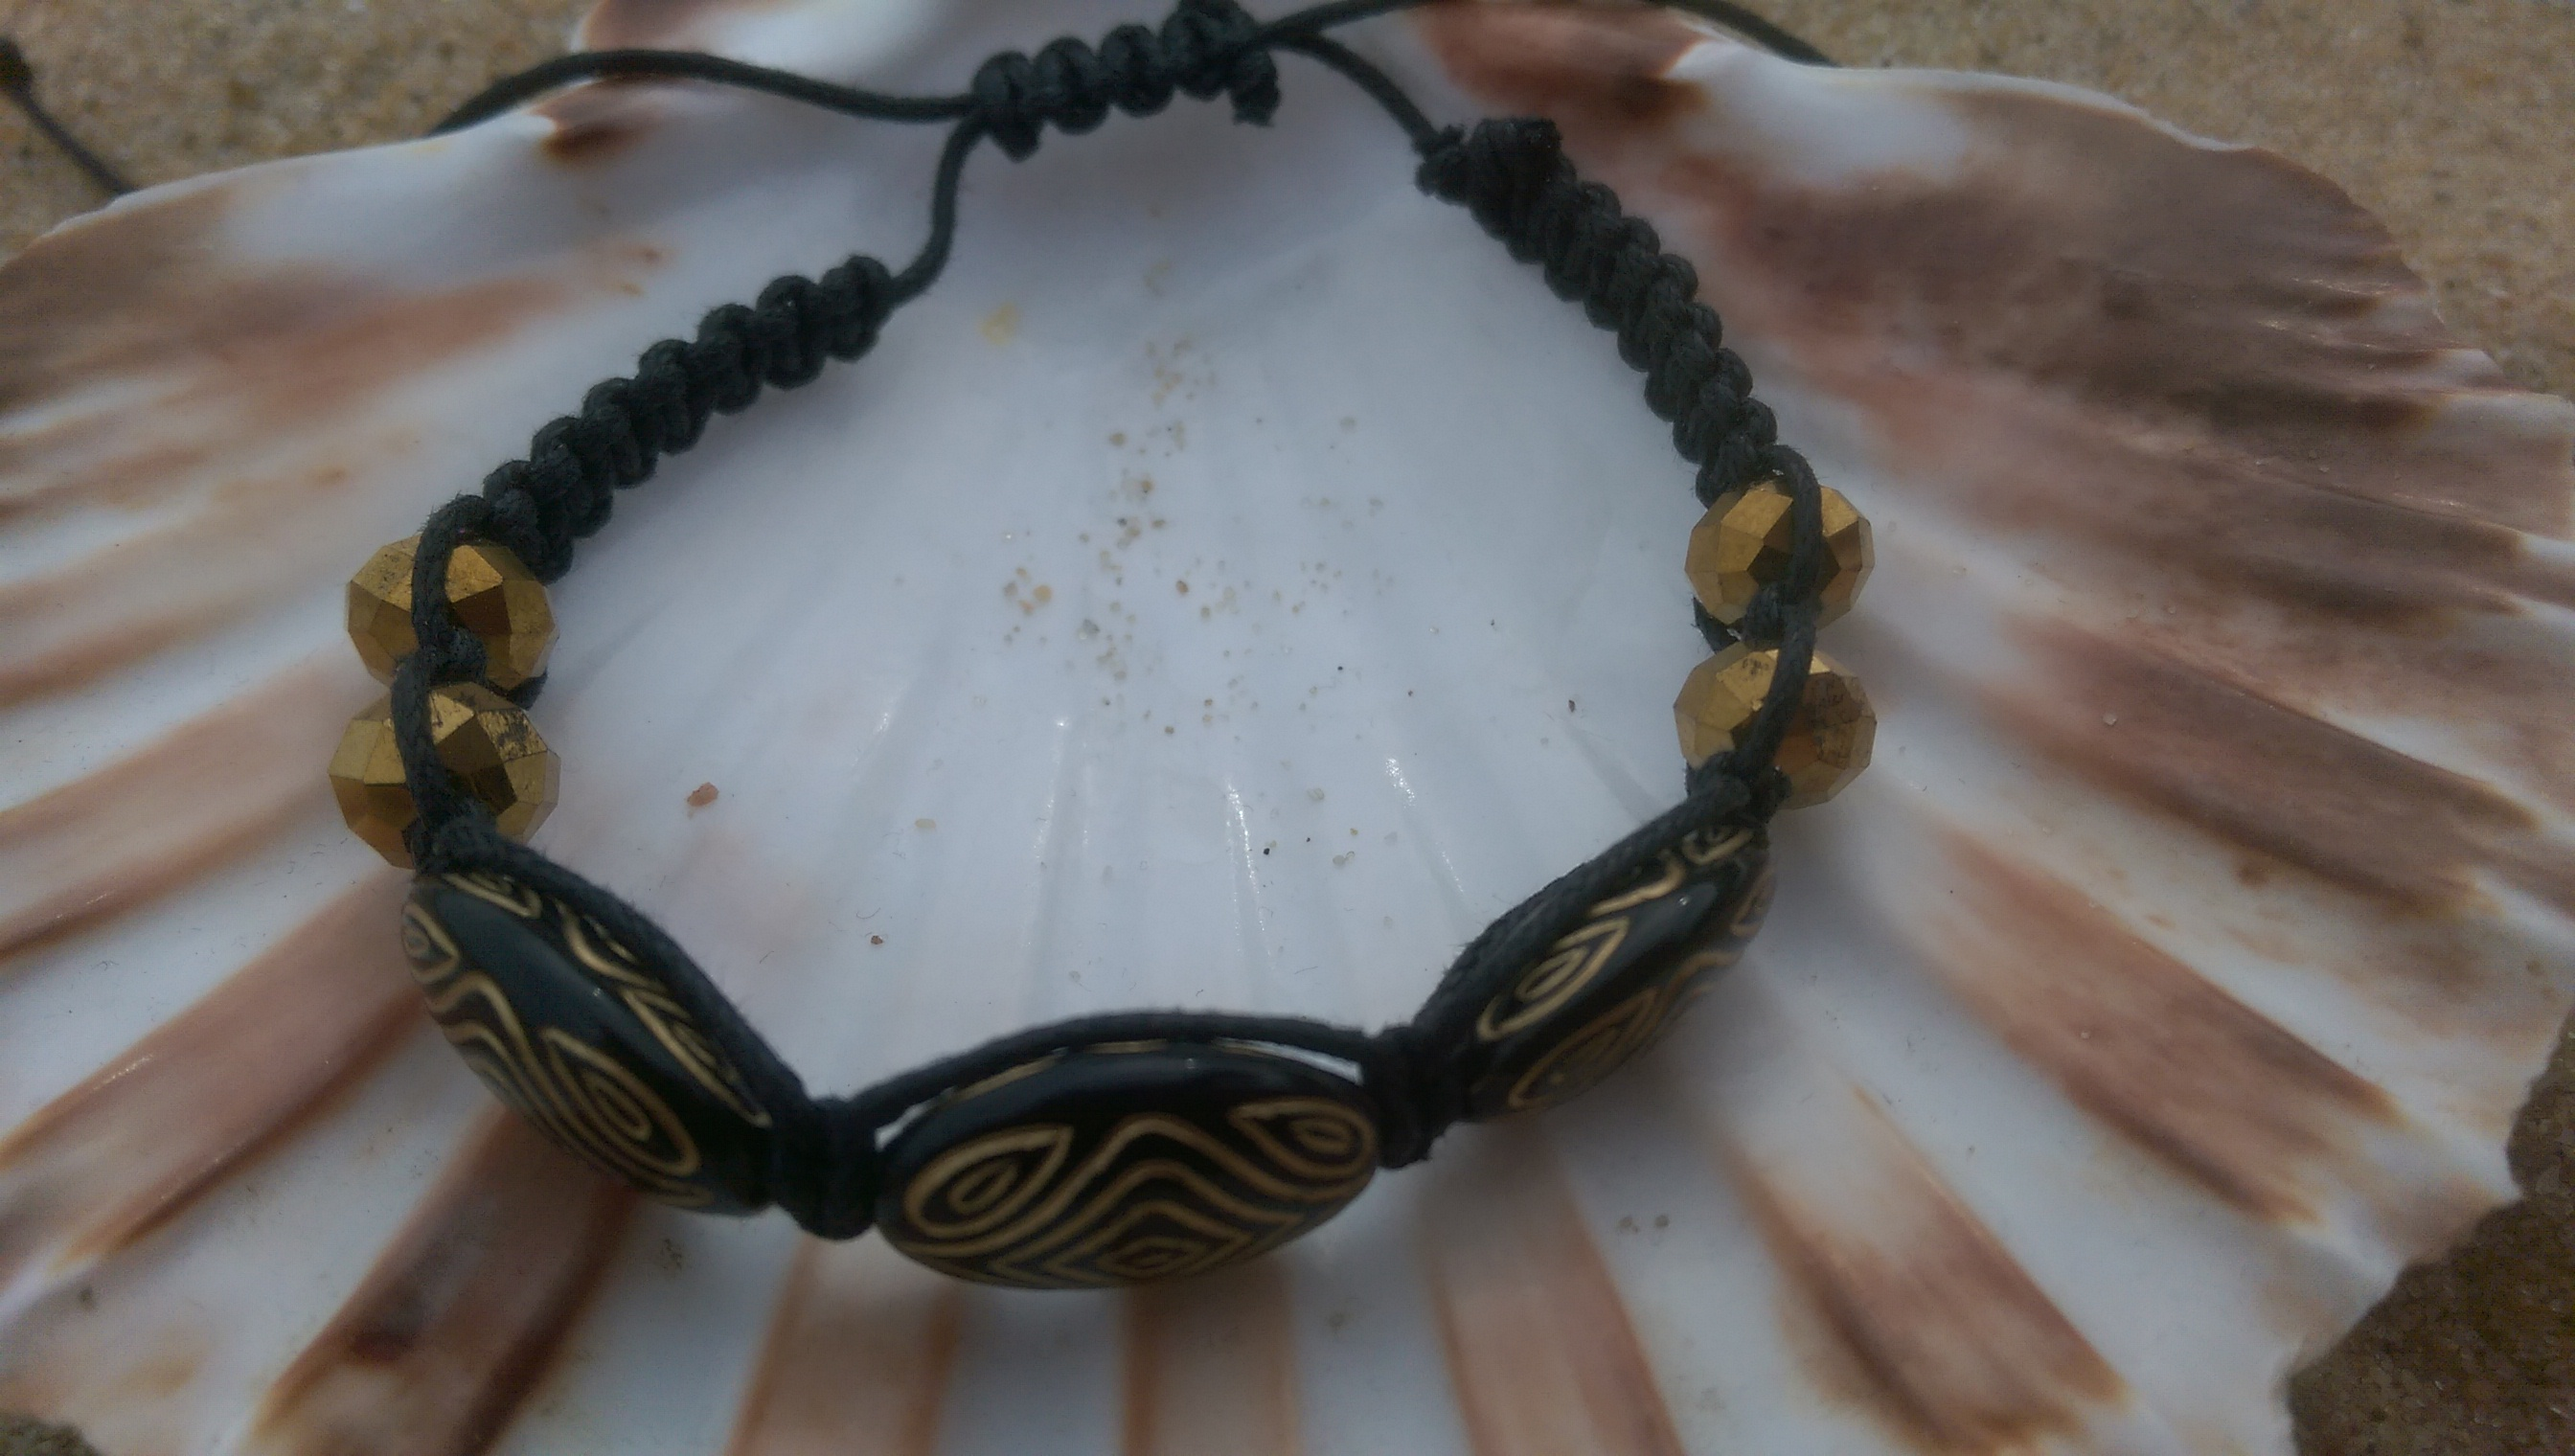 Black & gold shamballa-style